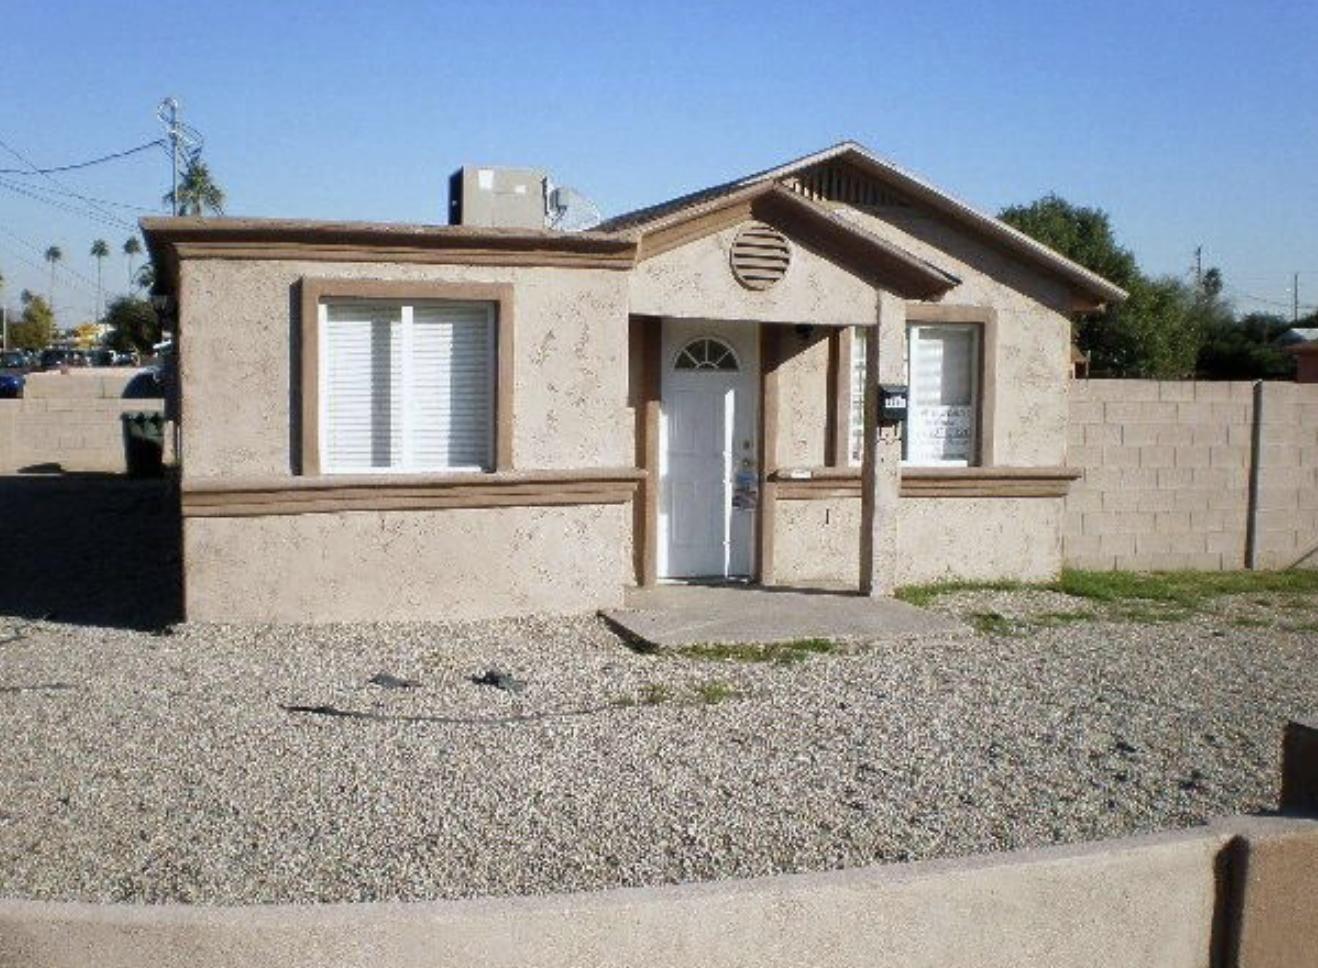 4141 N 23RD Avenue, Phoenix, AZ 85015 - MLS#: 6290012